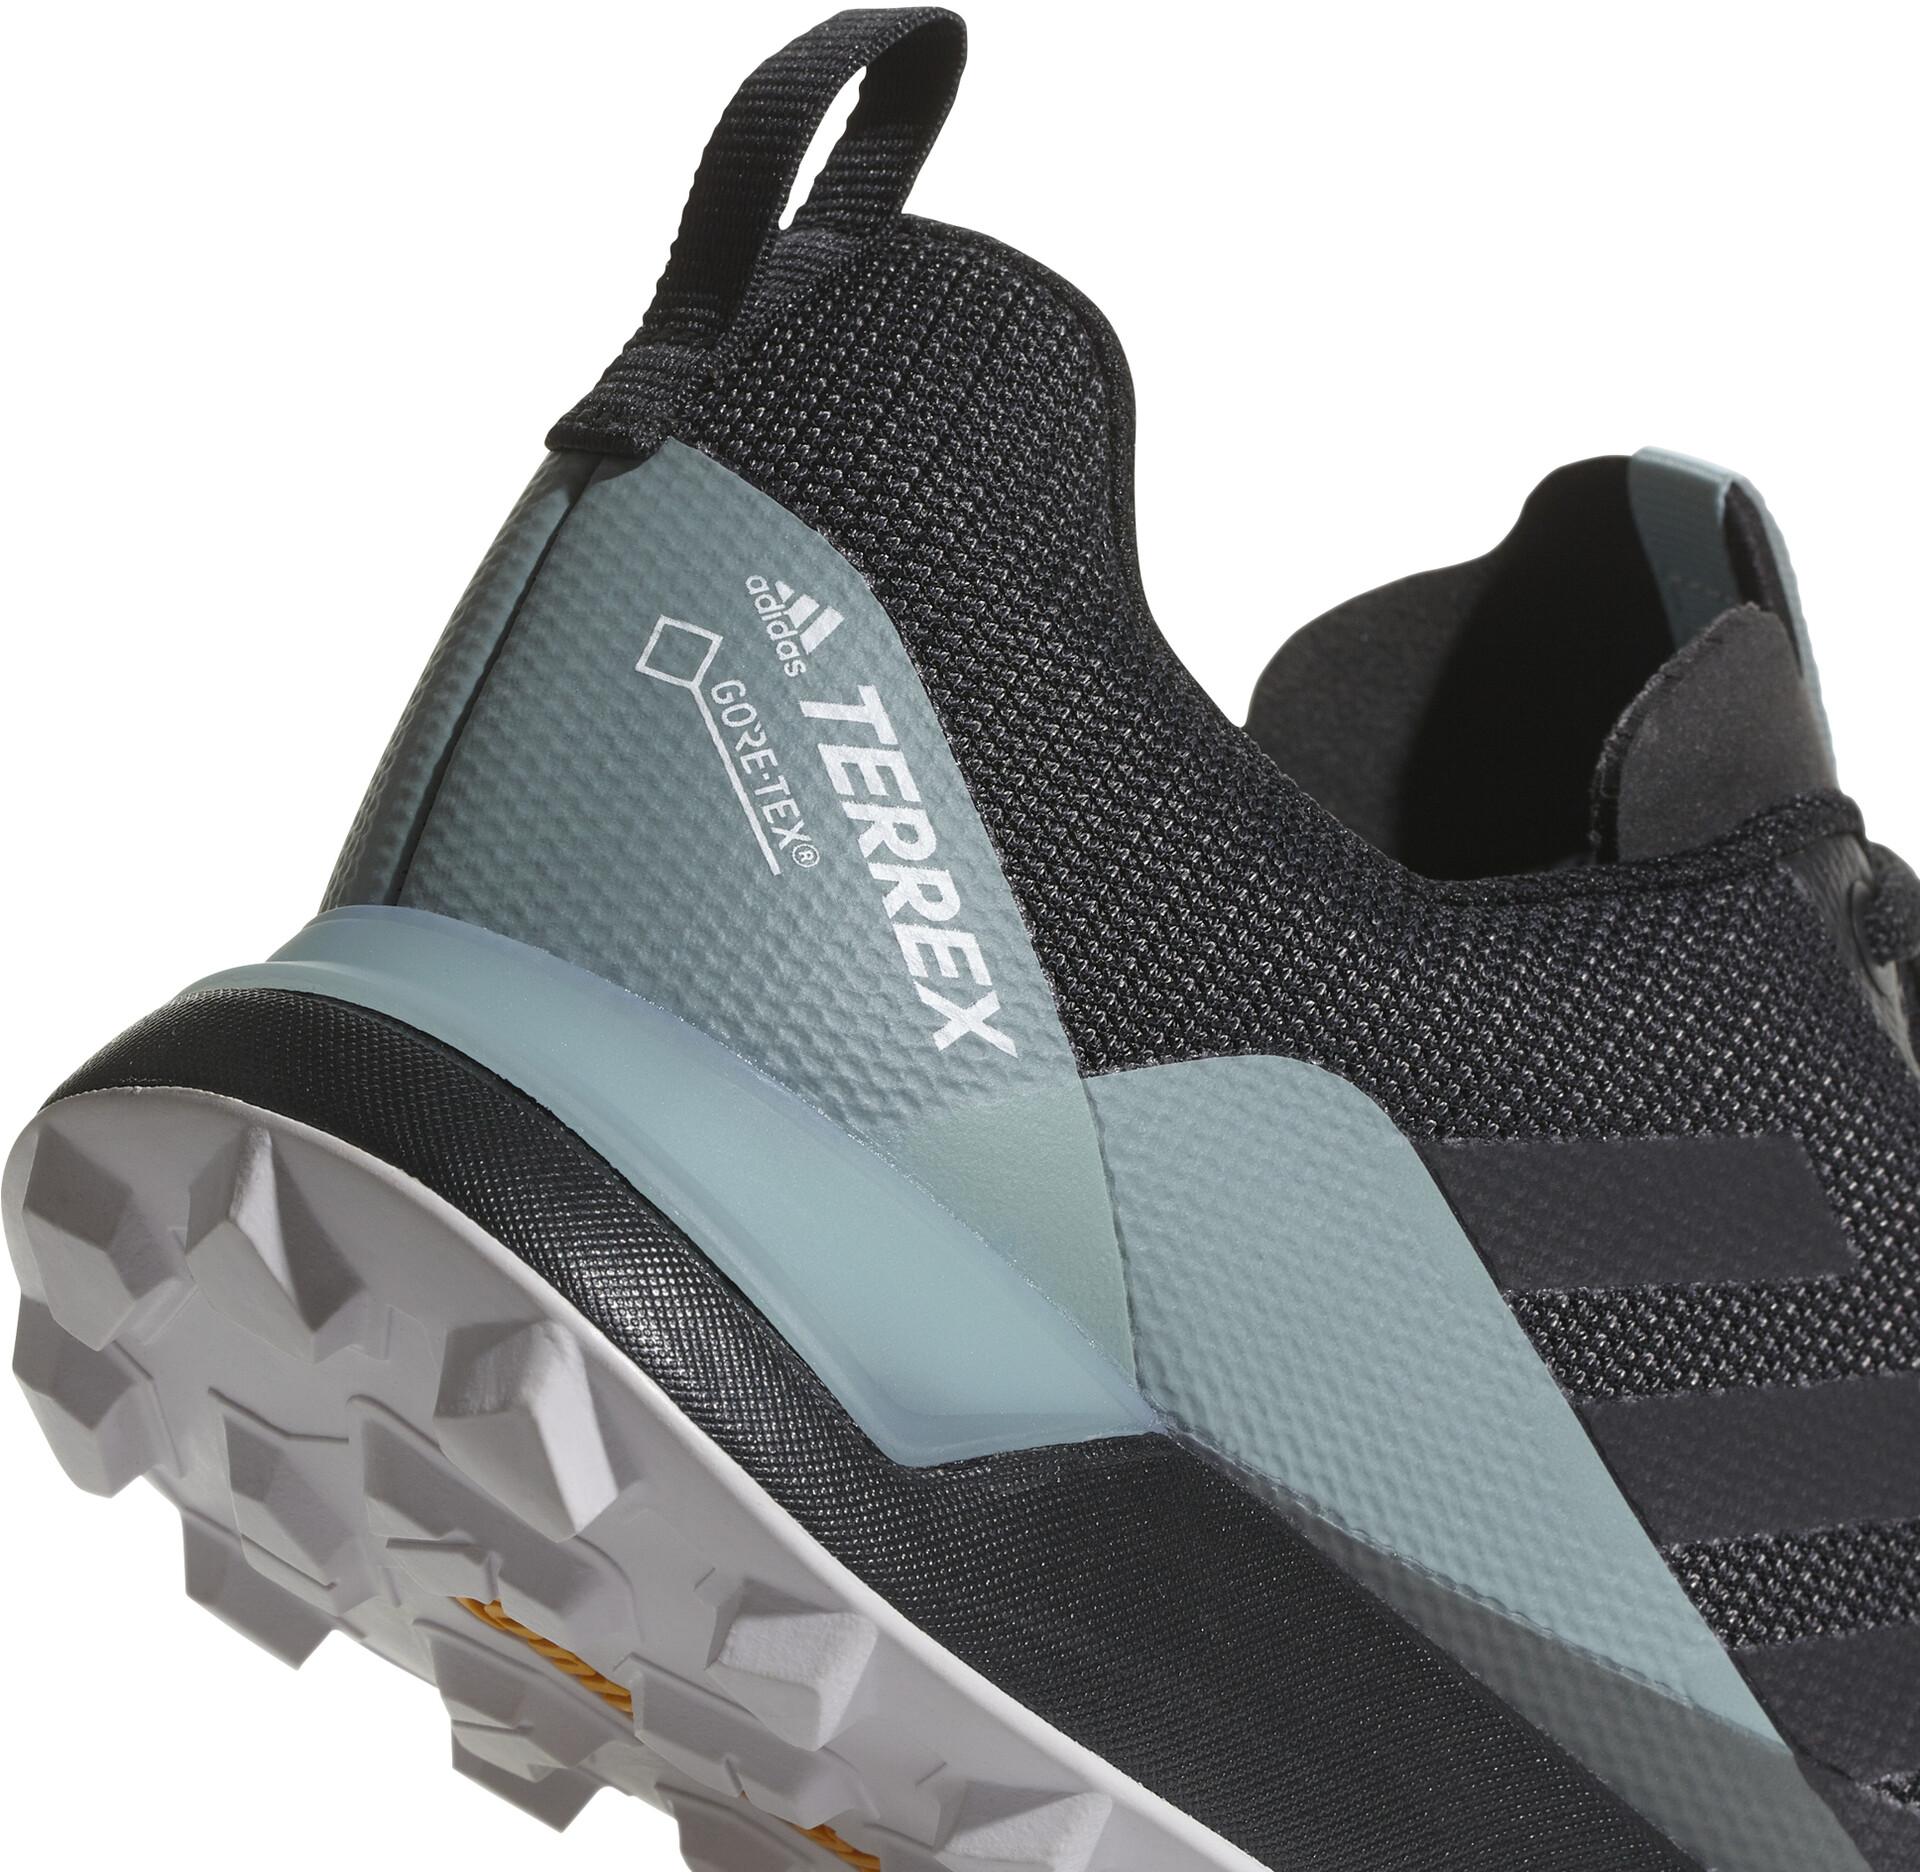 adidas TERREX CMTK GTX Schoenen Dames, carbon/core black/ashgrn